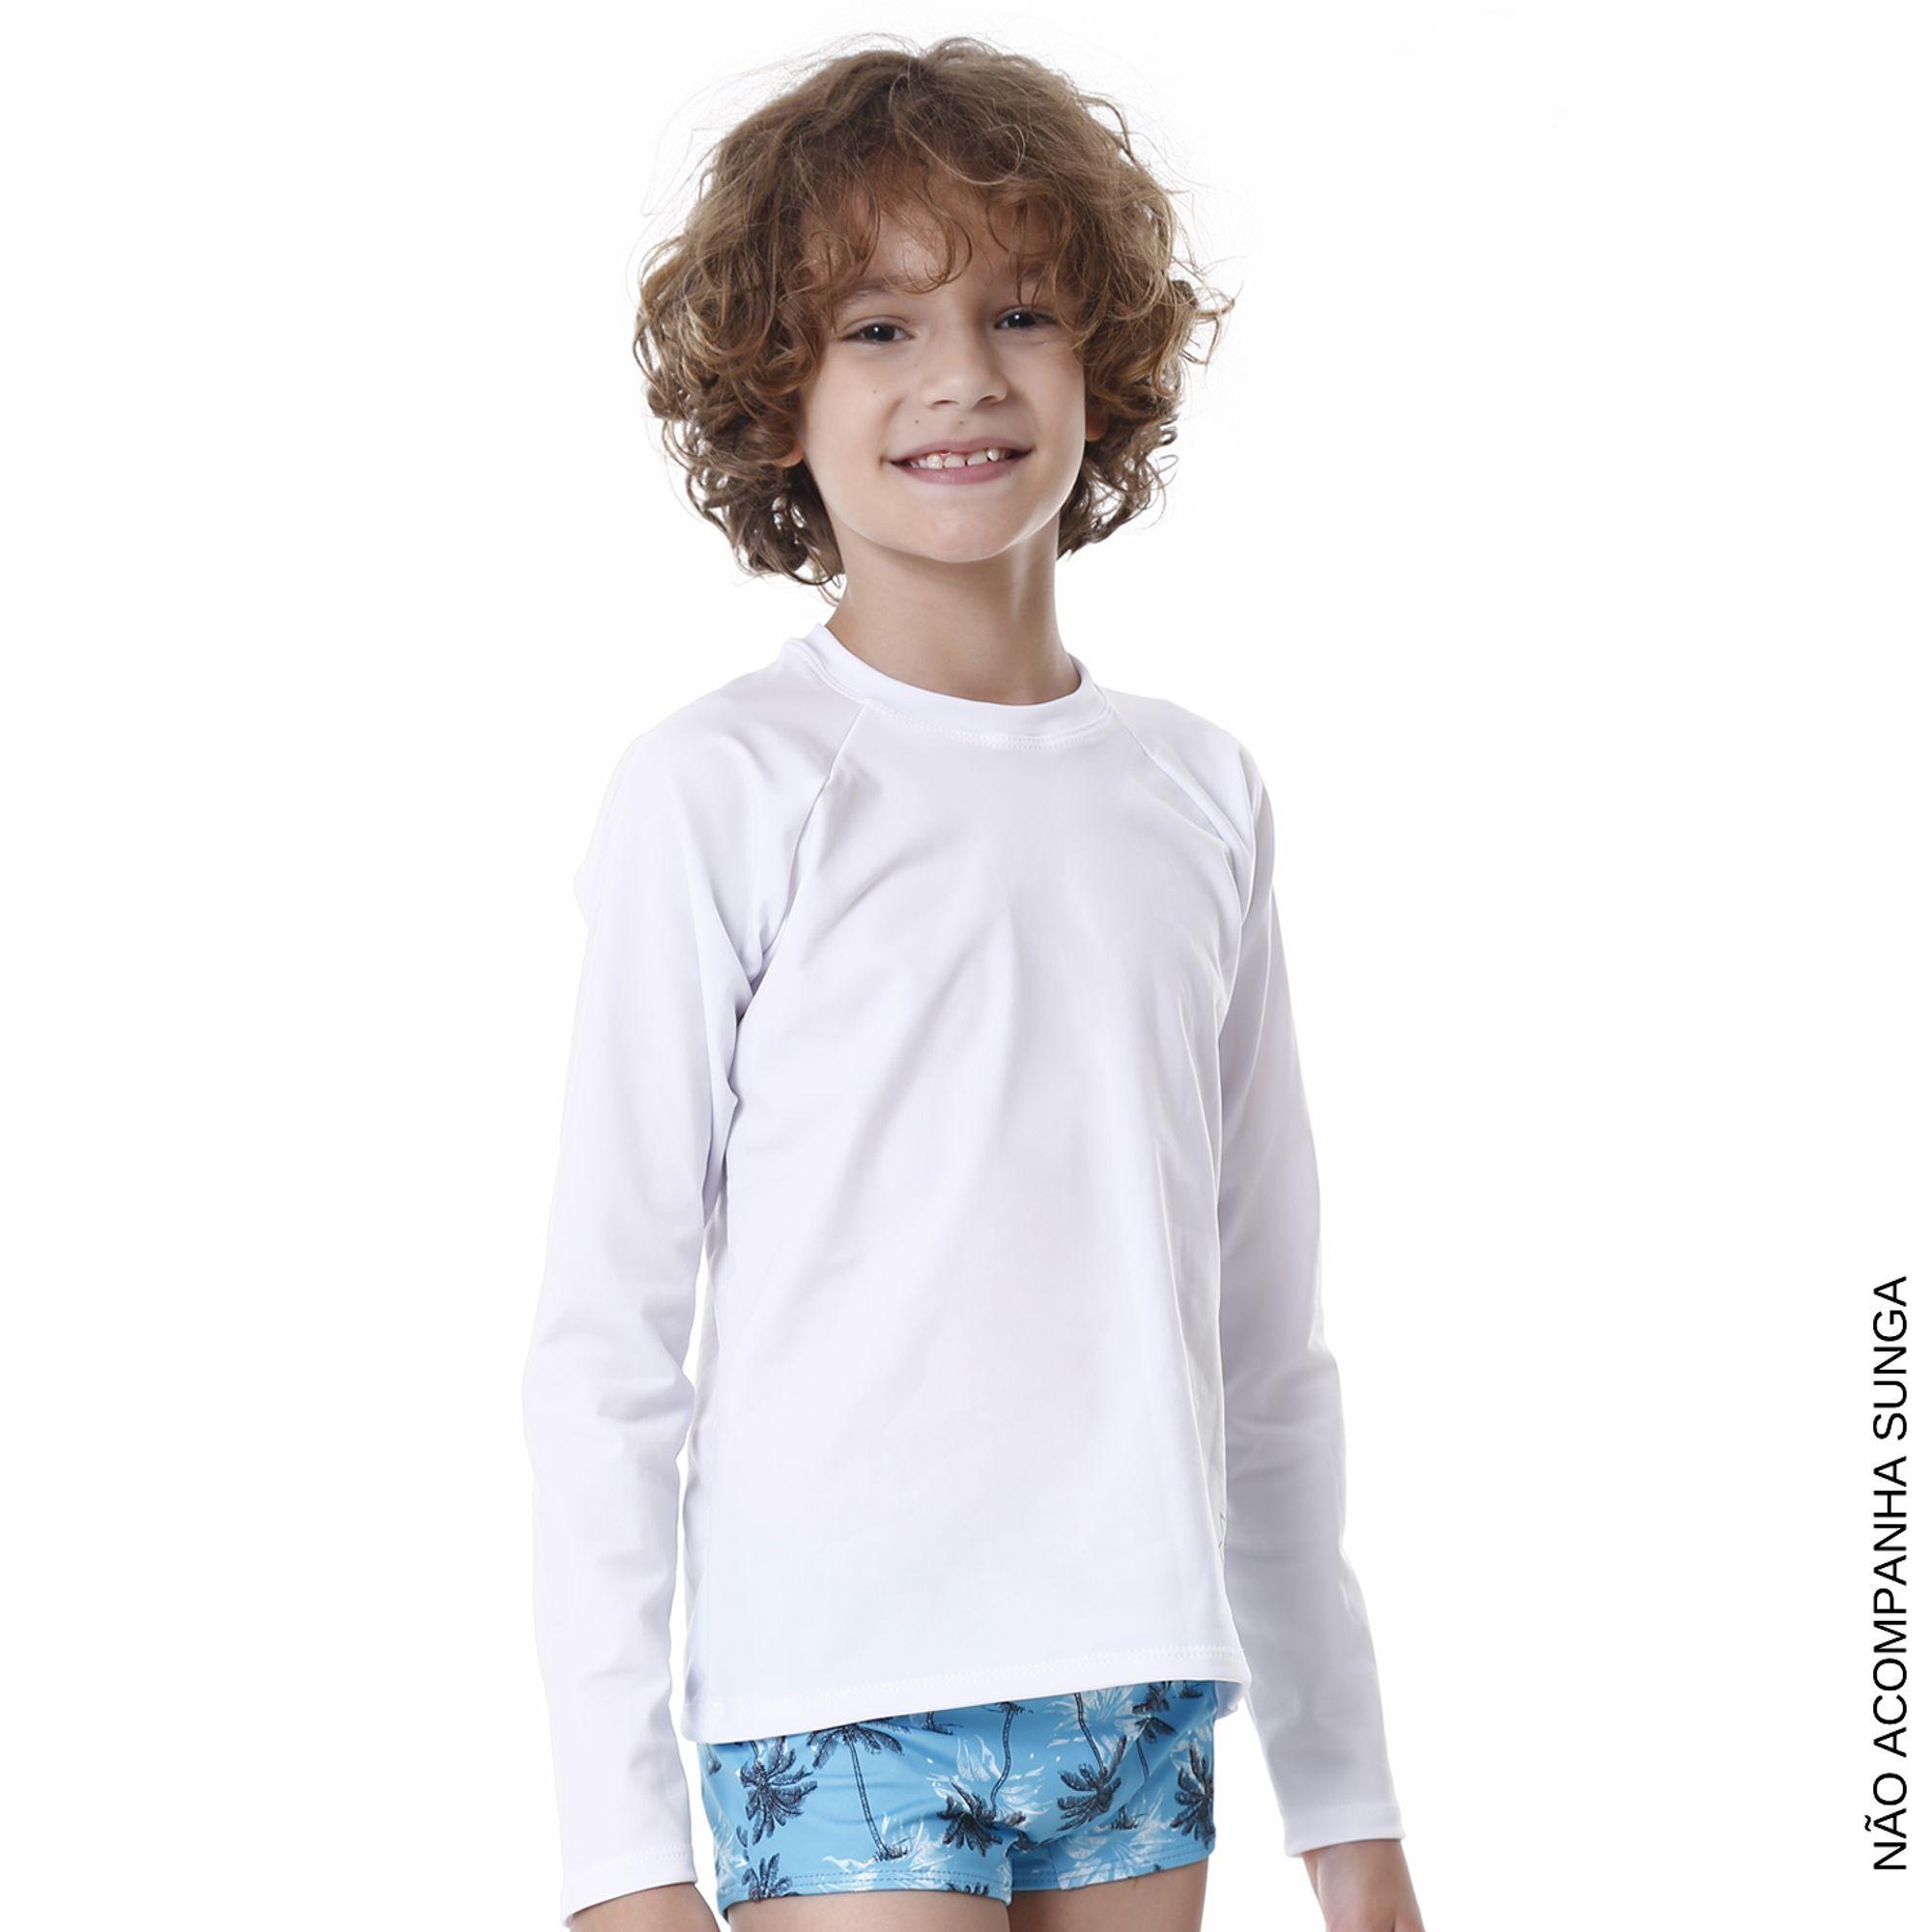 camiseta-infantil-praia-protecao-solar-manga-longa-branca-1